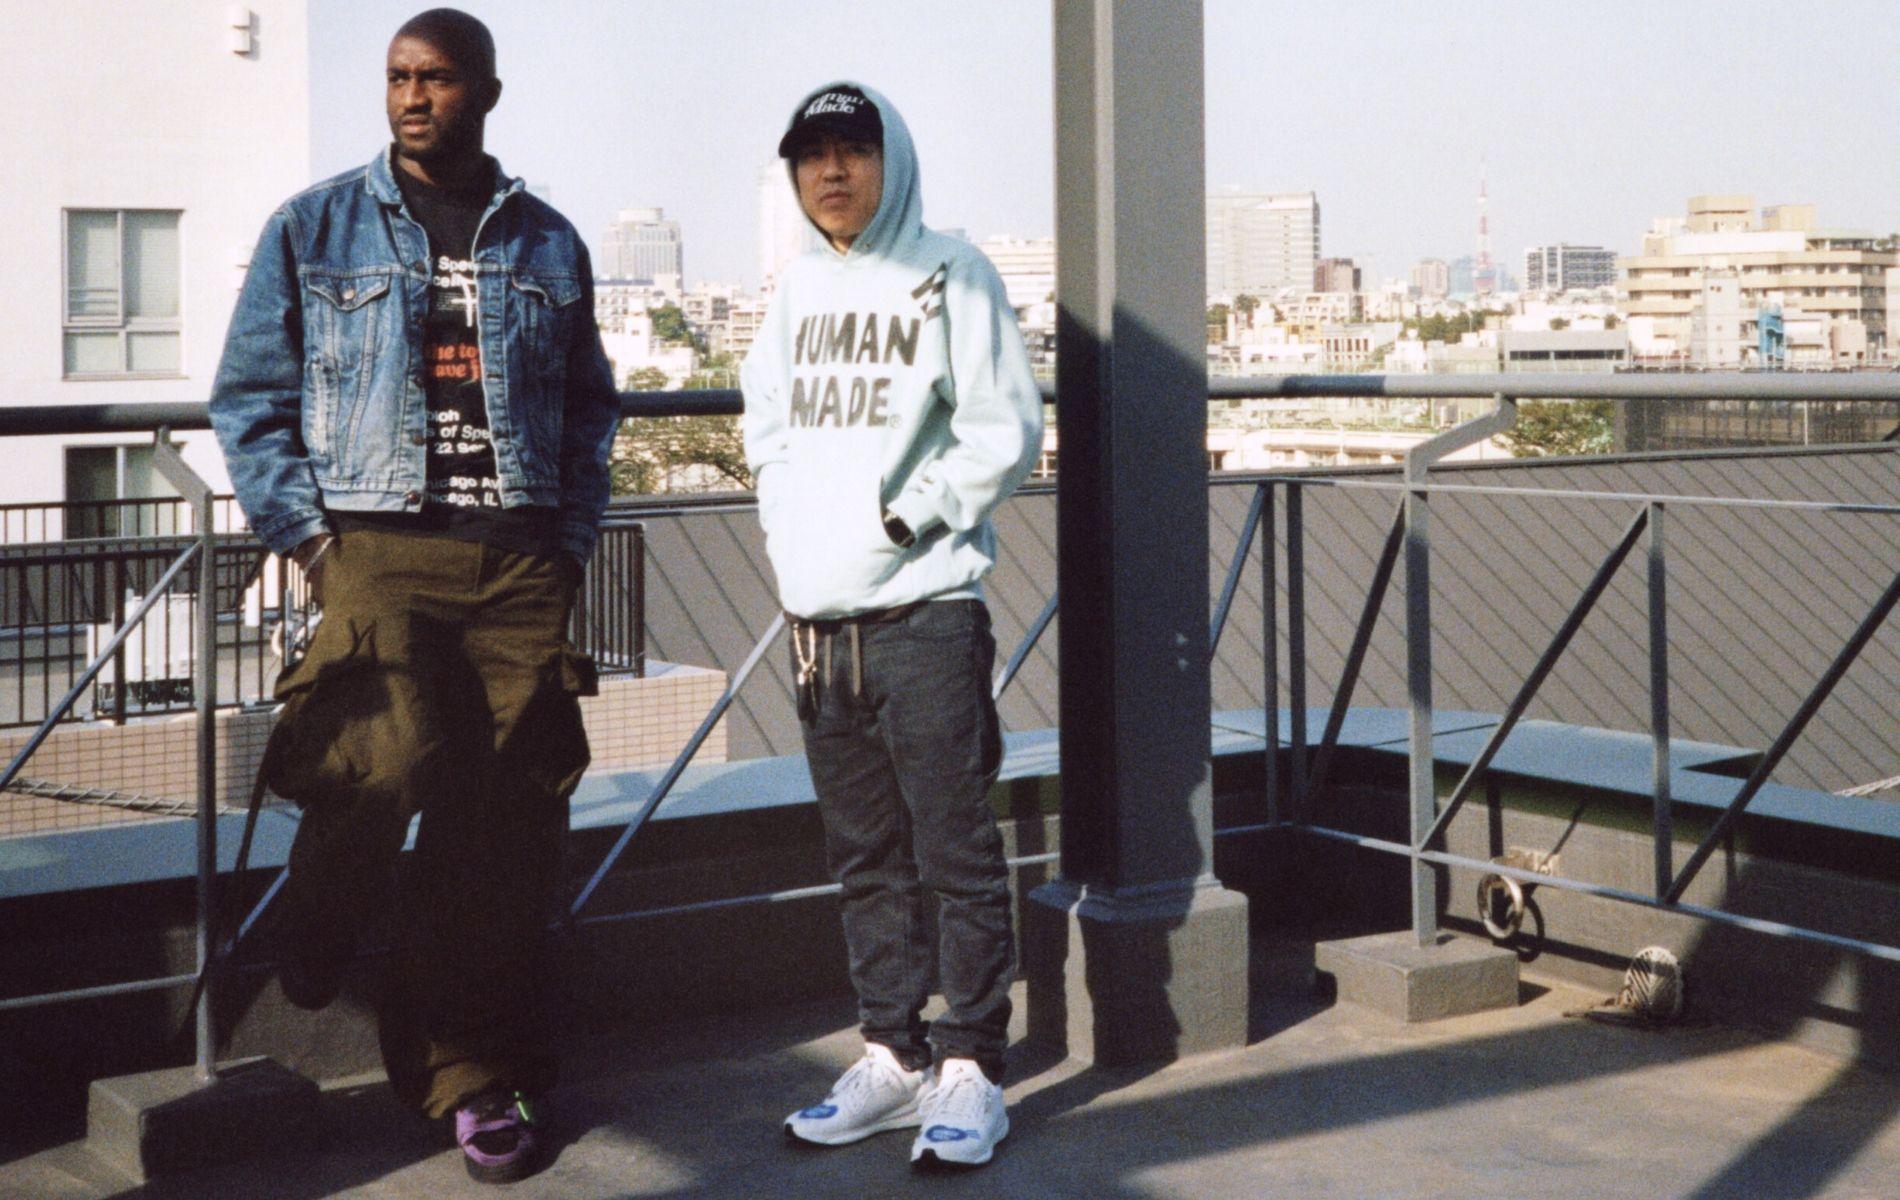 Louis Vuitton Launches Collaboration Between Virgil Abloh and Nigo